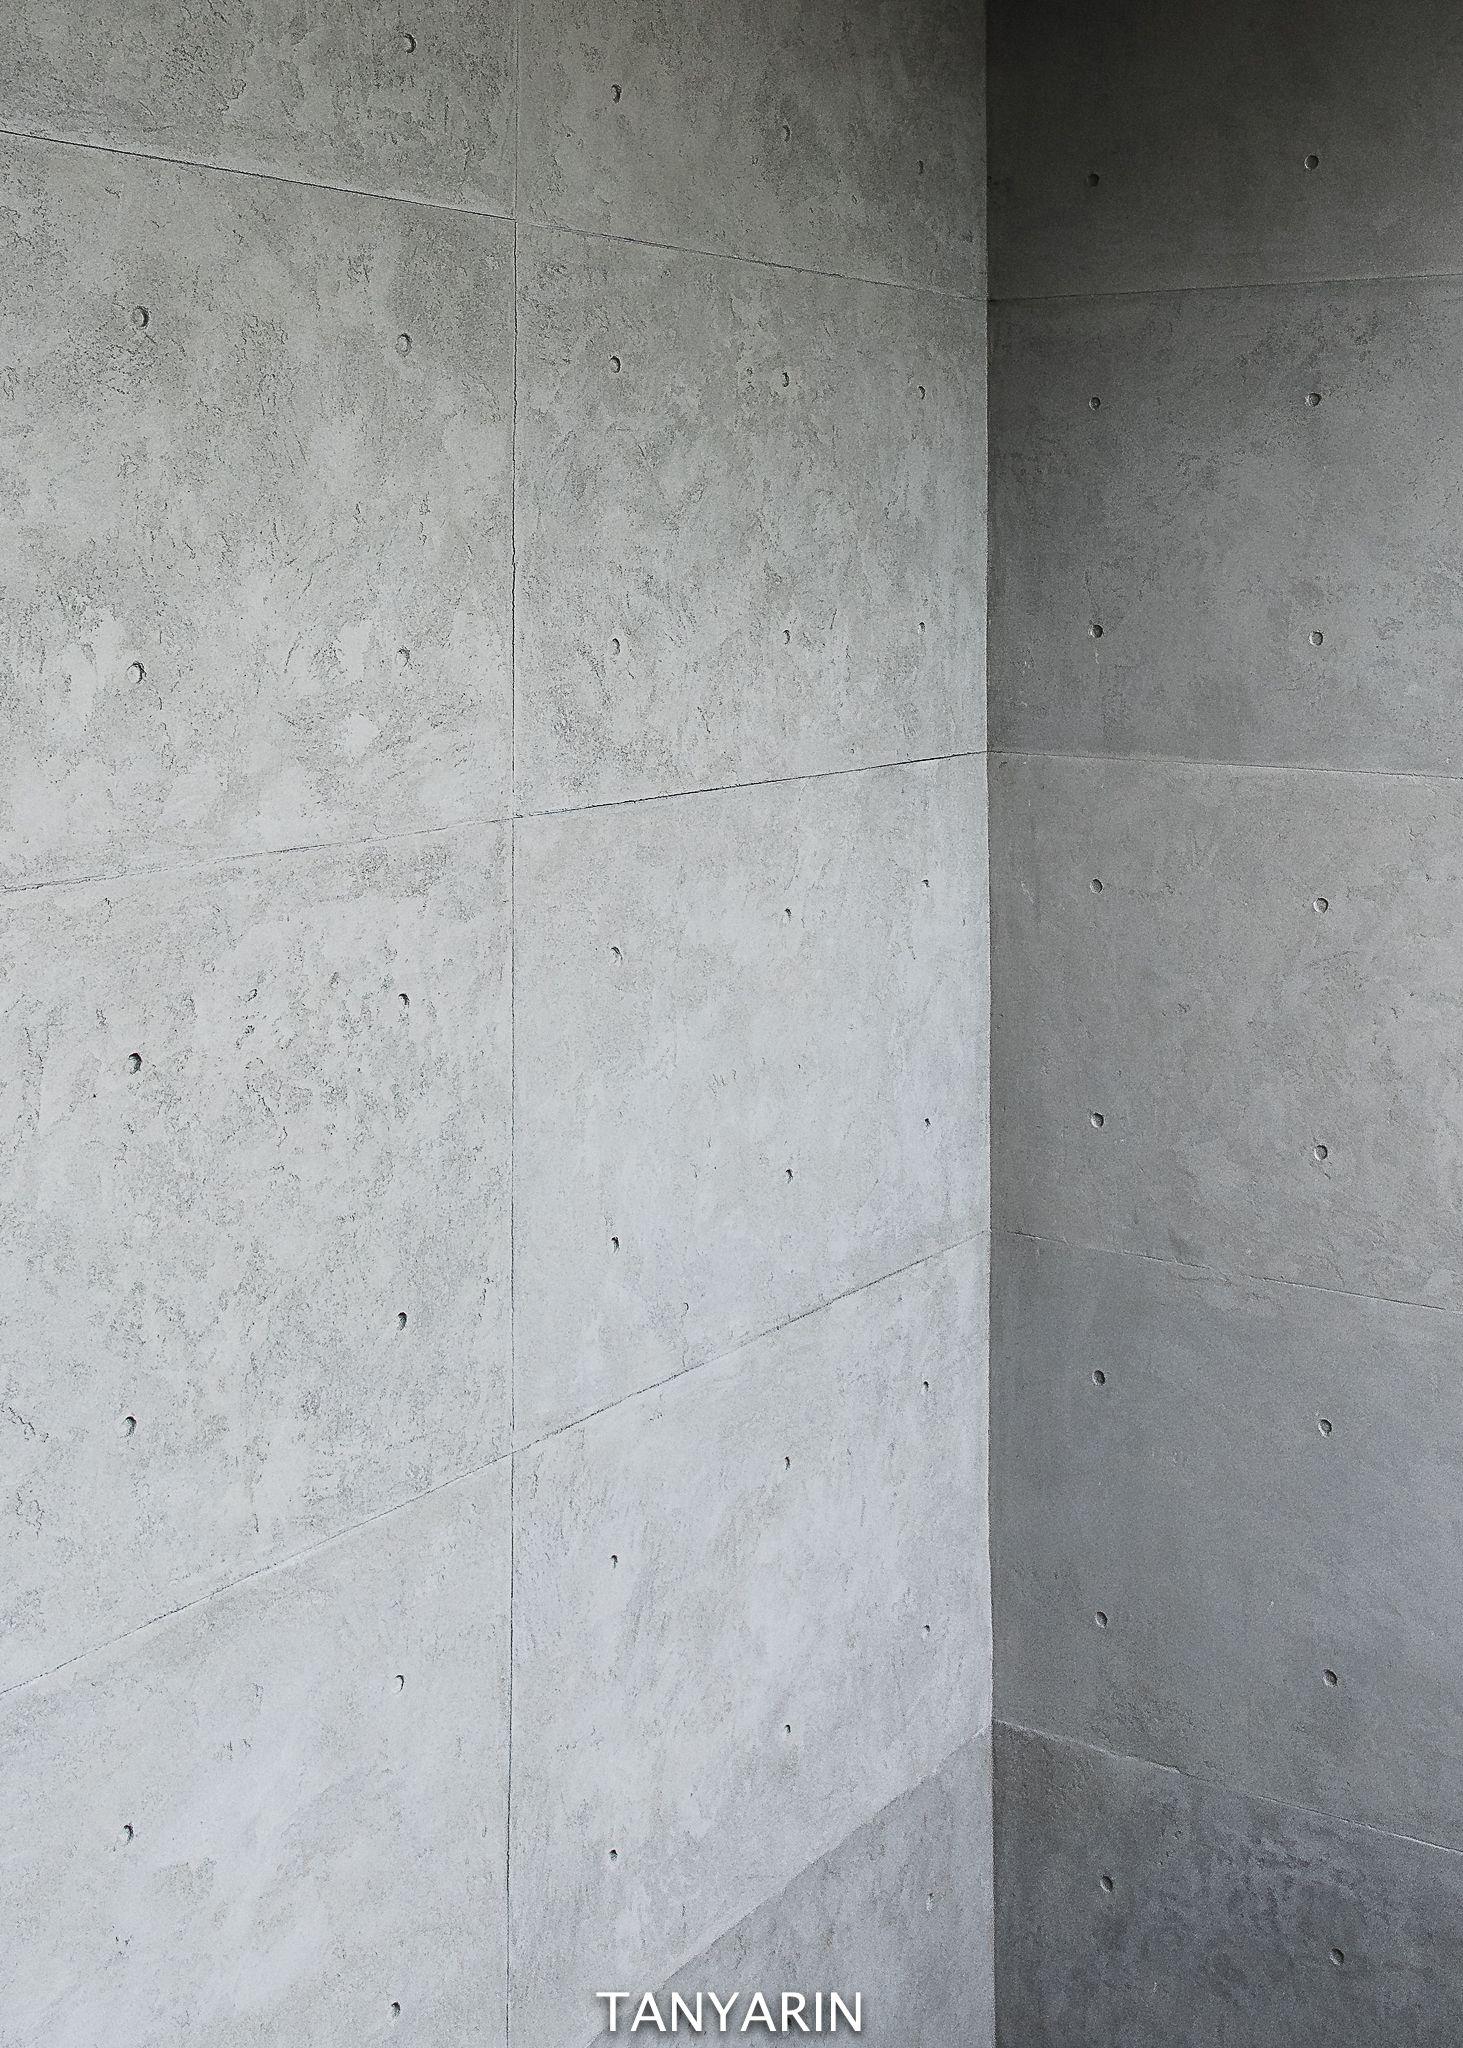 Tanyarin Created Armourcoat Koncrete Concrete Plaster On Wall As Similar As Tadao Ando Concrete Nel 2020